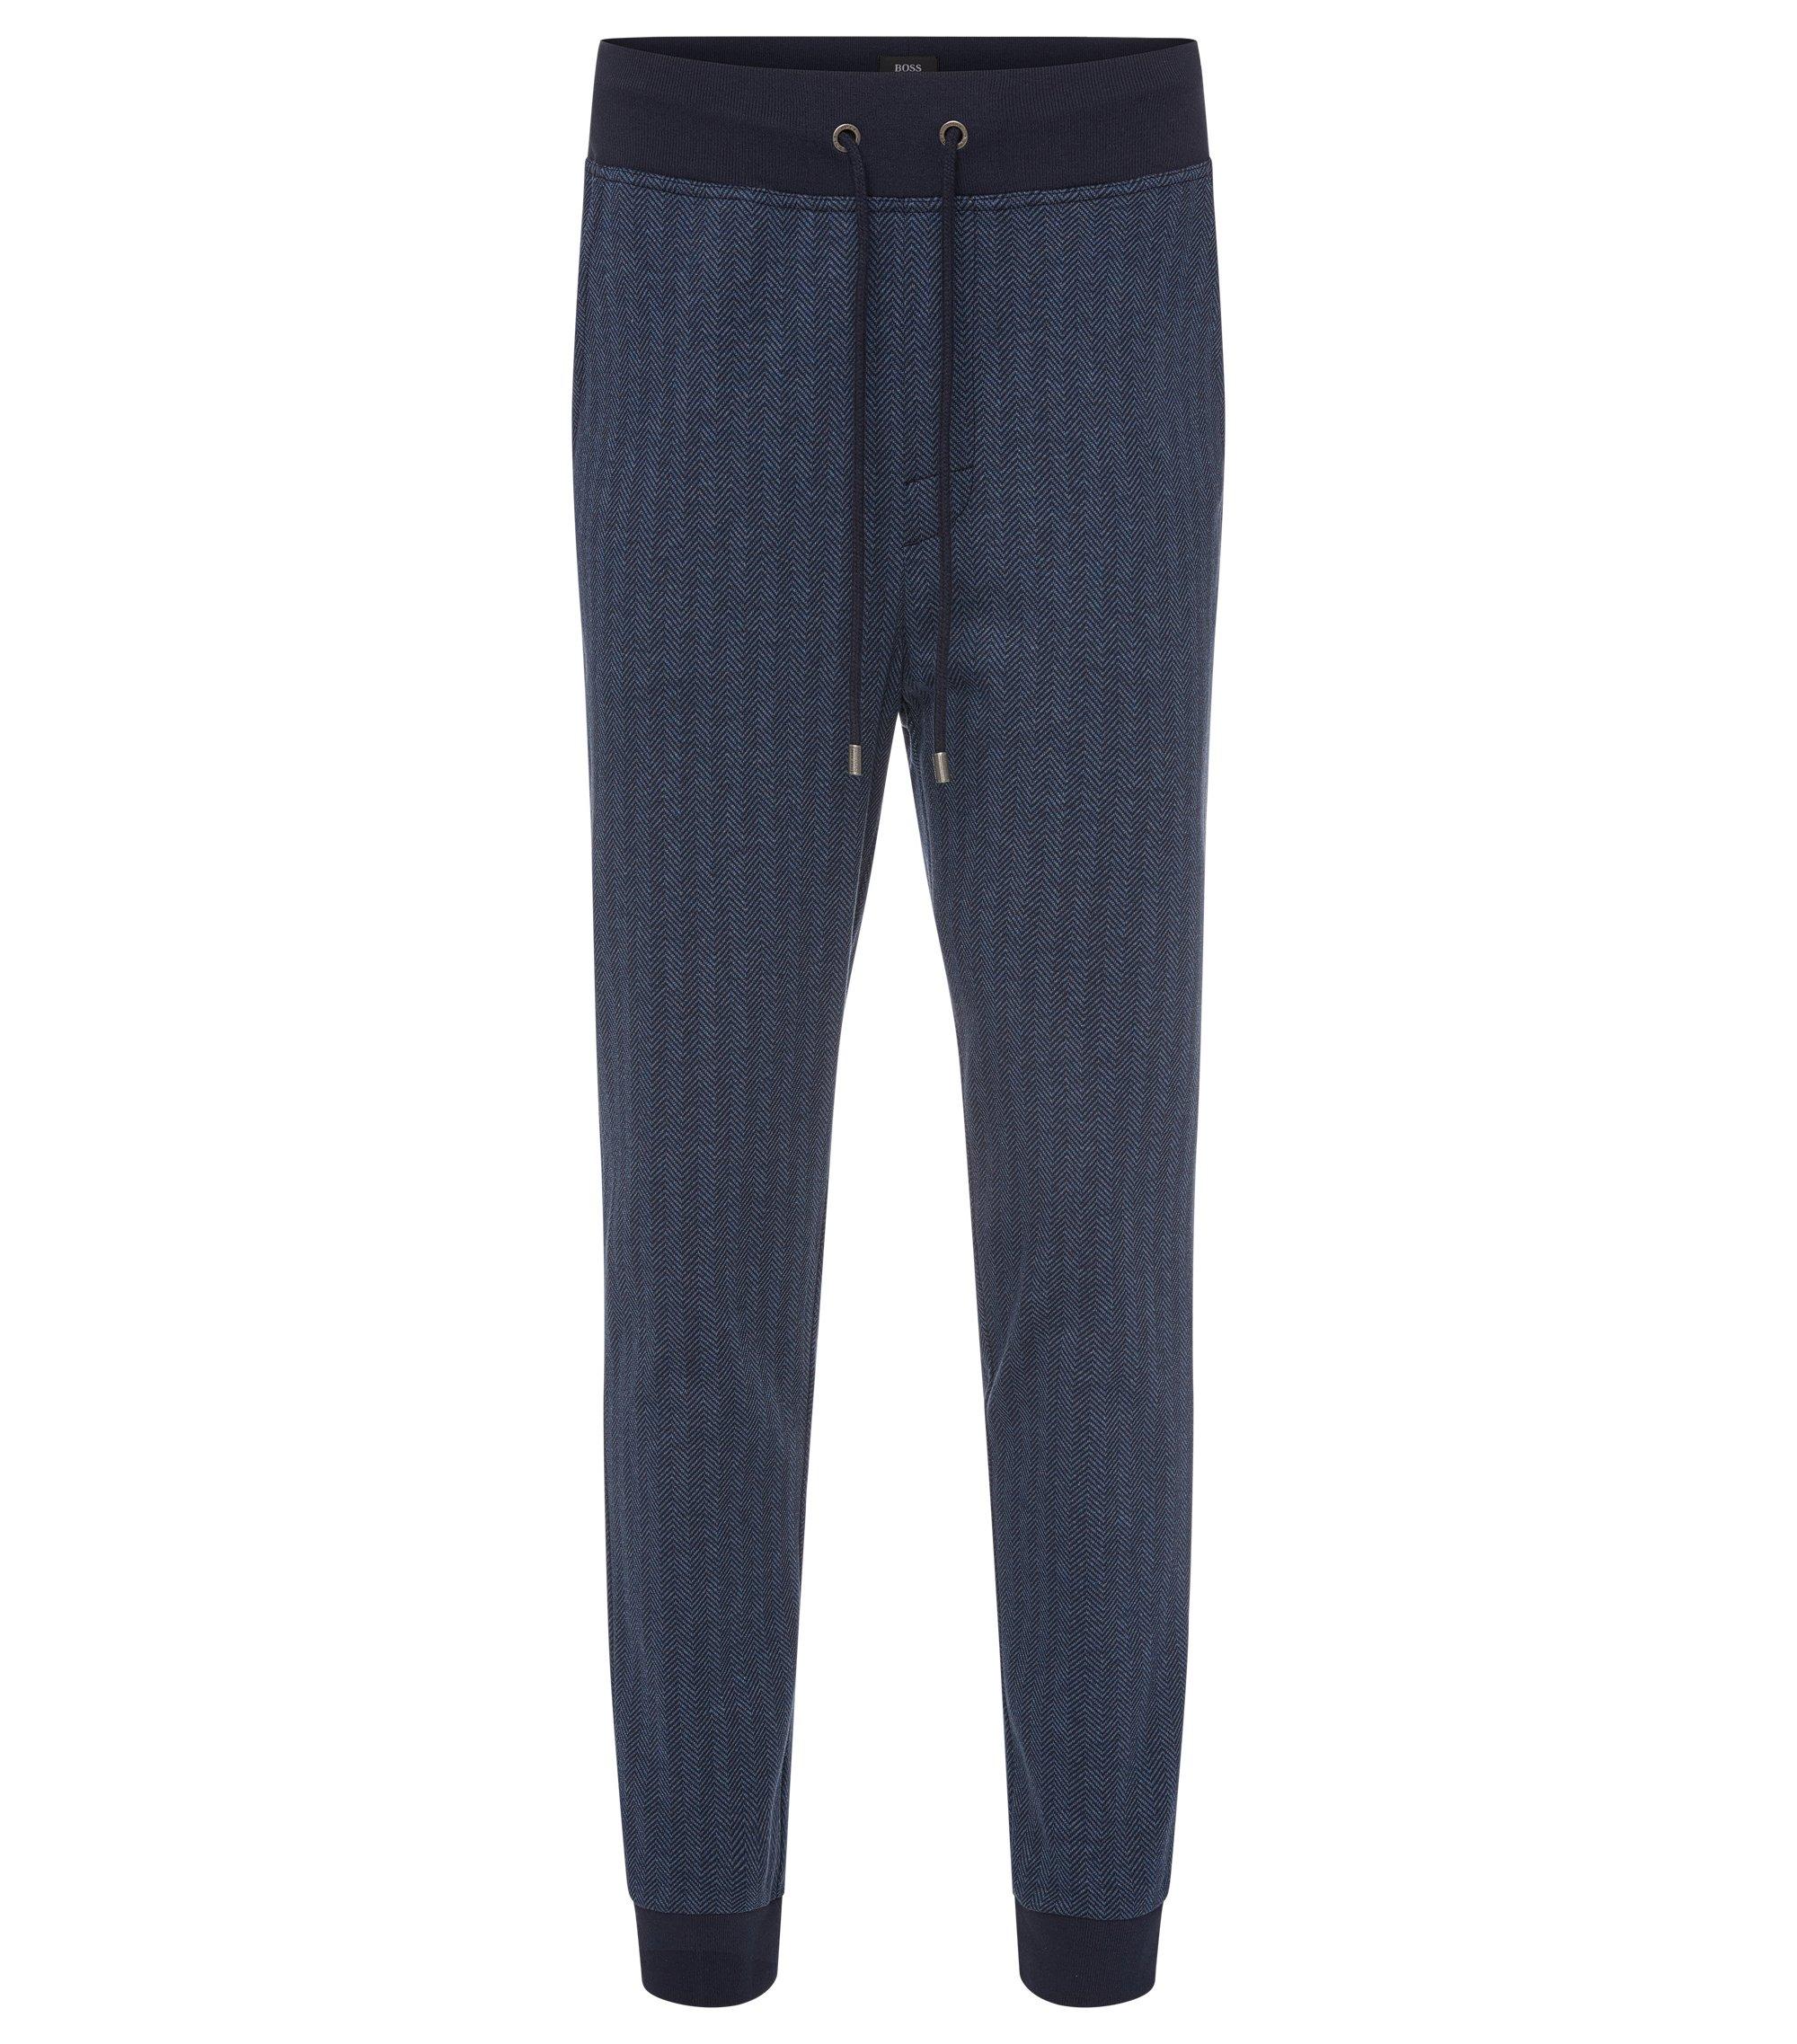 Cotton Jersey Lounge Pant | Long Pant Cuffs, Dark Blue